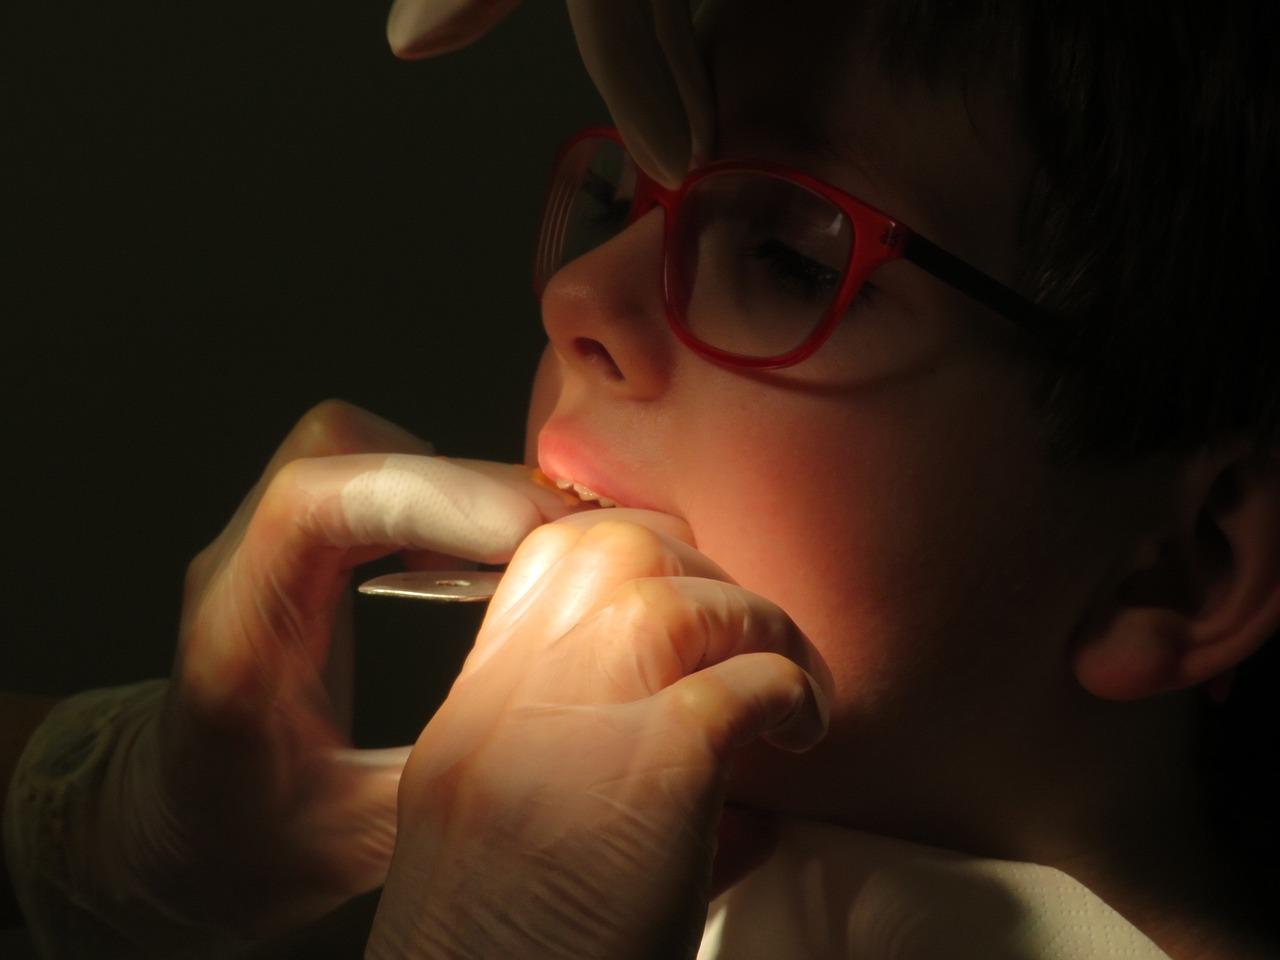 kid having a dental brace